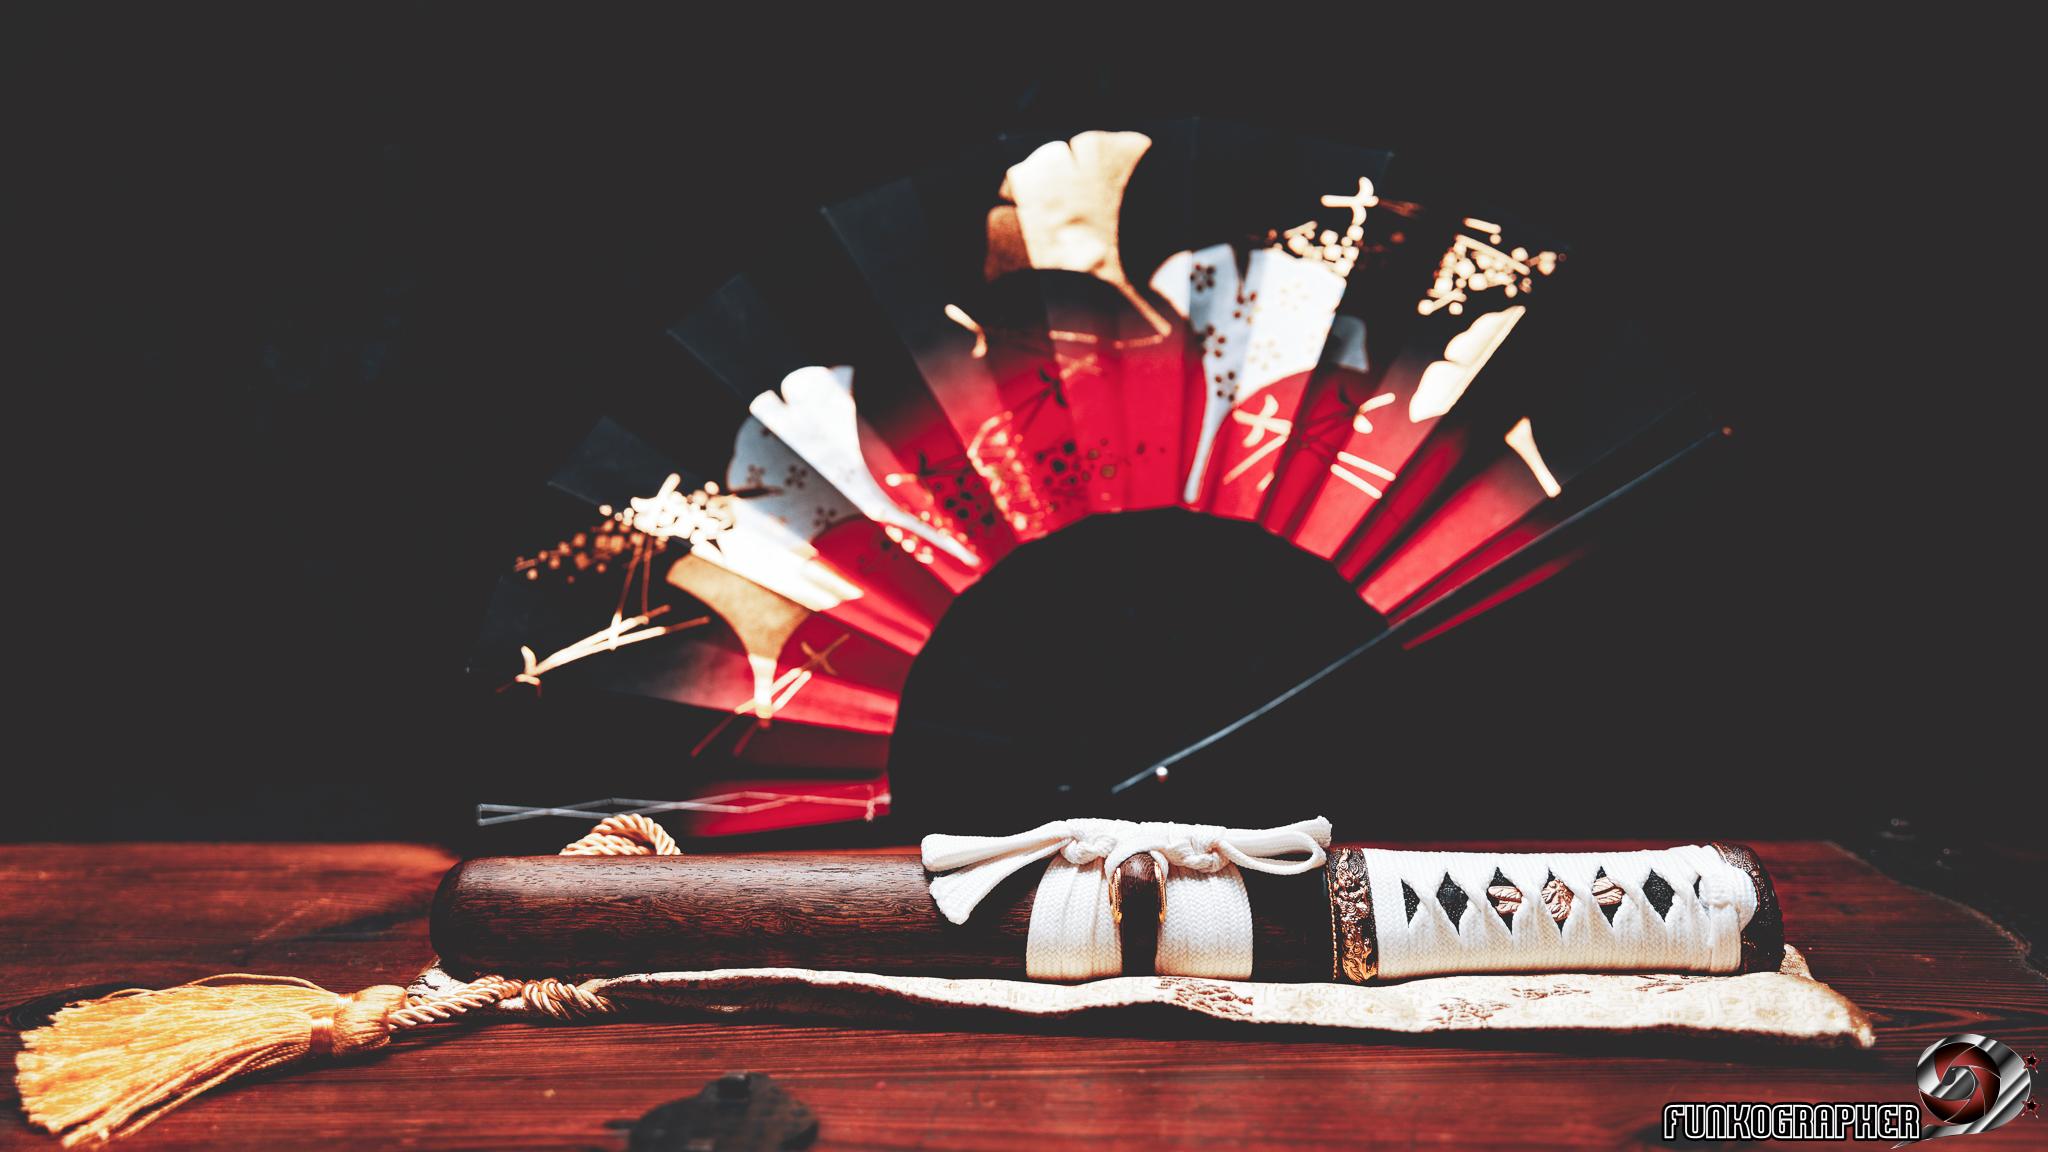 24-70mm, arme blanche, art, artisanal, artkatana.com, Auteur, composition, couteau, creatif, D850, damas, exposition, fineart, flash, forge, france, french, Funkographer, geïko, graphisme, gravure, https://funkographer.fr, illustration, japon, katana, lame, light, lightroom, lorraine, n/b, nancy, Nikon, oeuvre, Photo, photographe, photographer, photographie, photoshop, Portrait, samourai, samurai, shooting, sigma, soie, strobism, studio, Tanto, Tirage